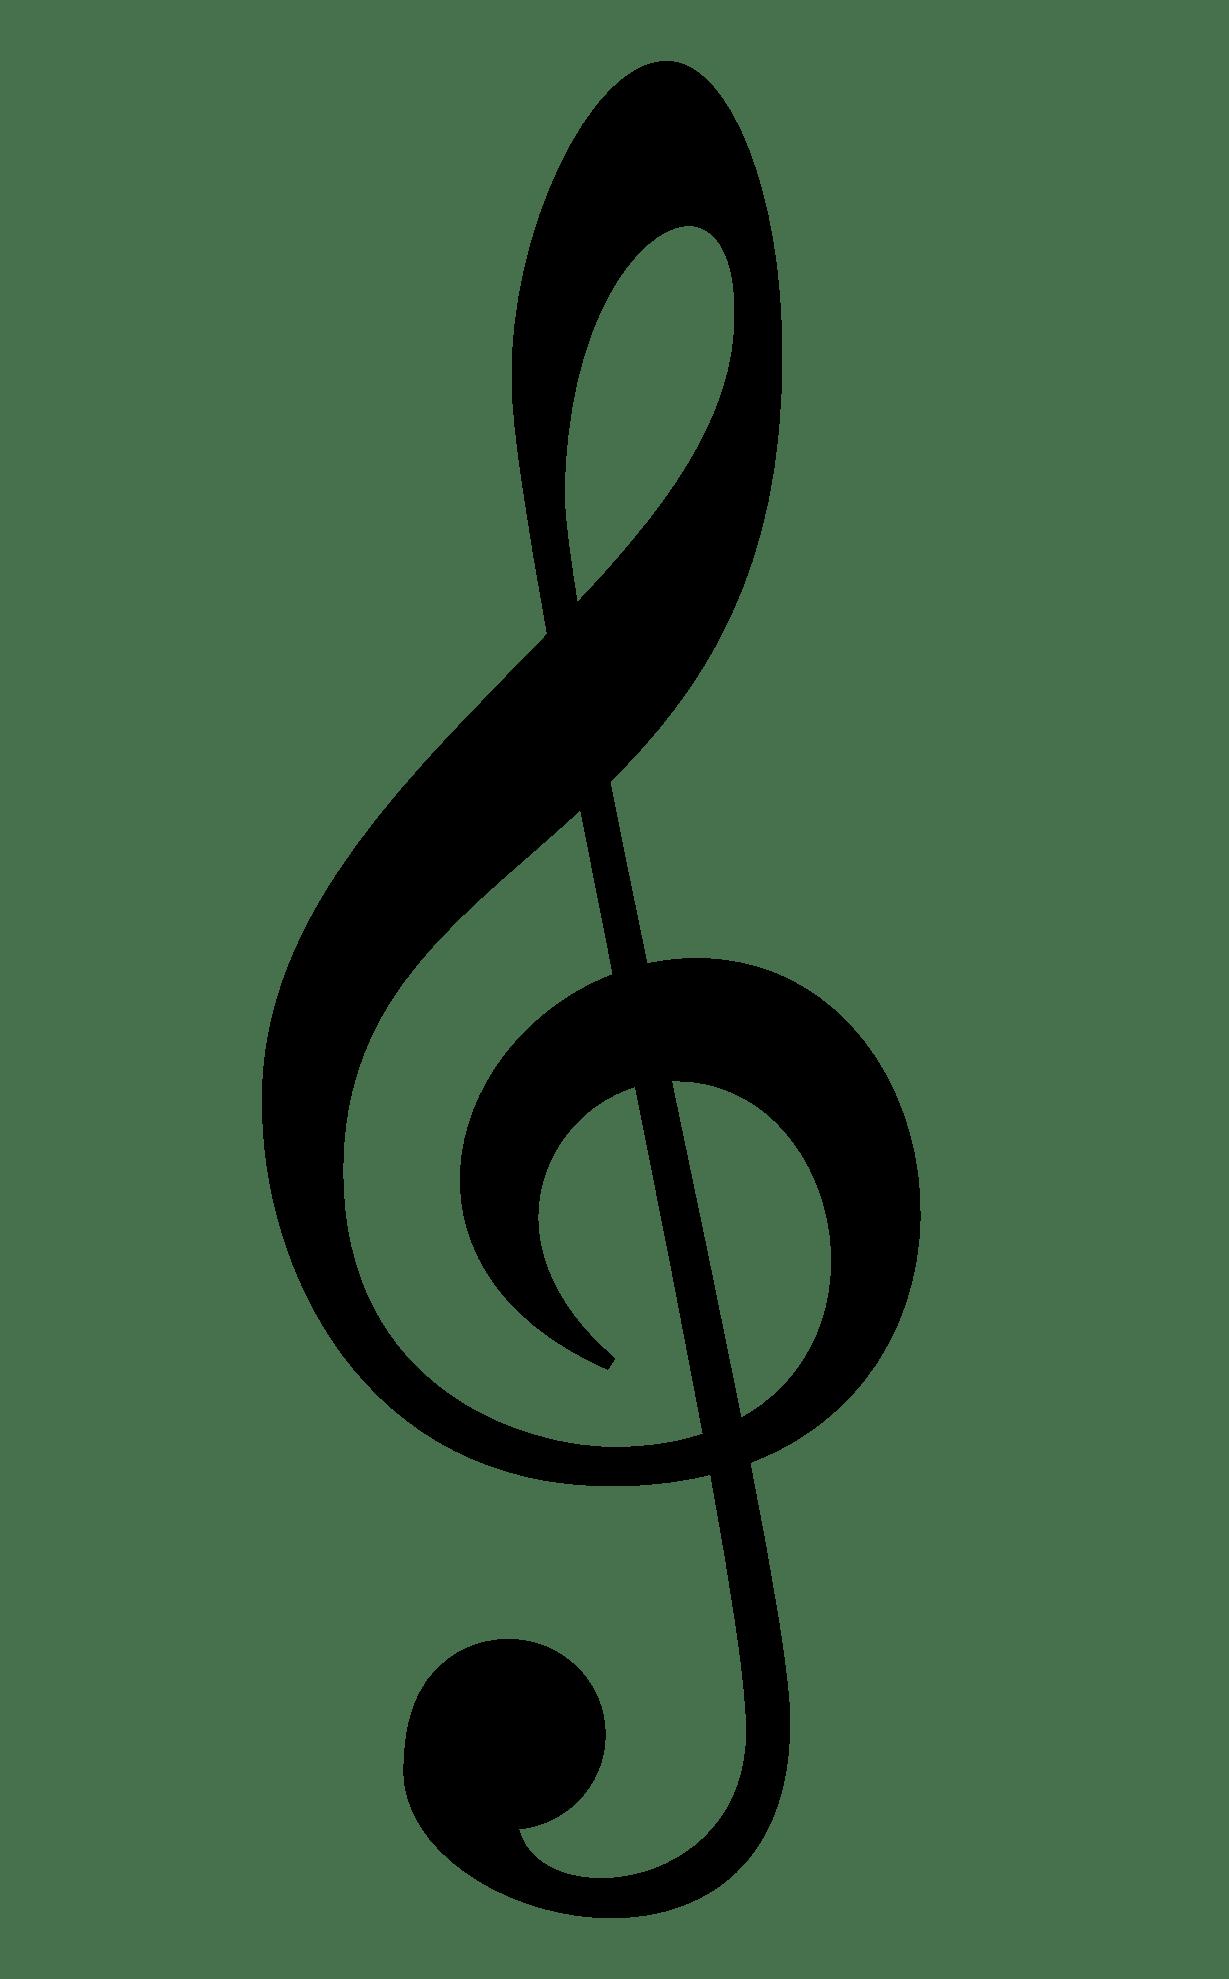 Clarinet Clipart Outline Clarinet Outline Transparent